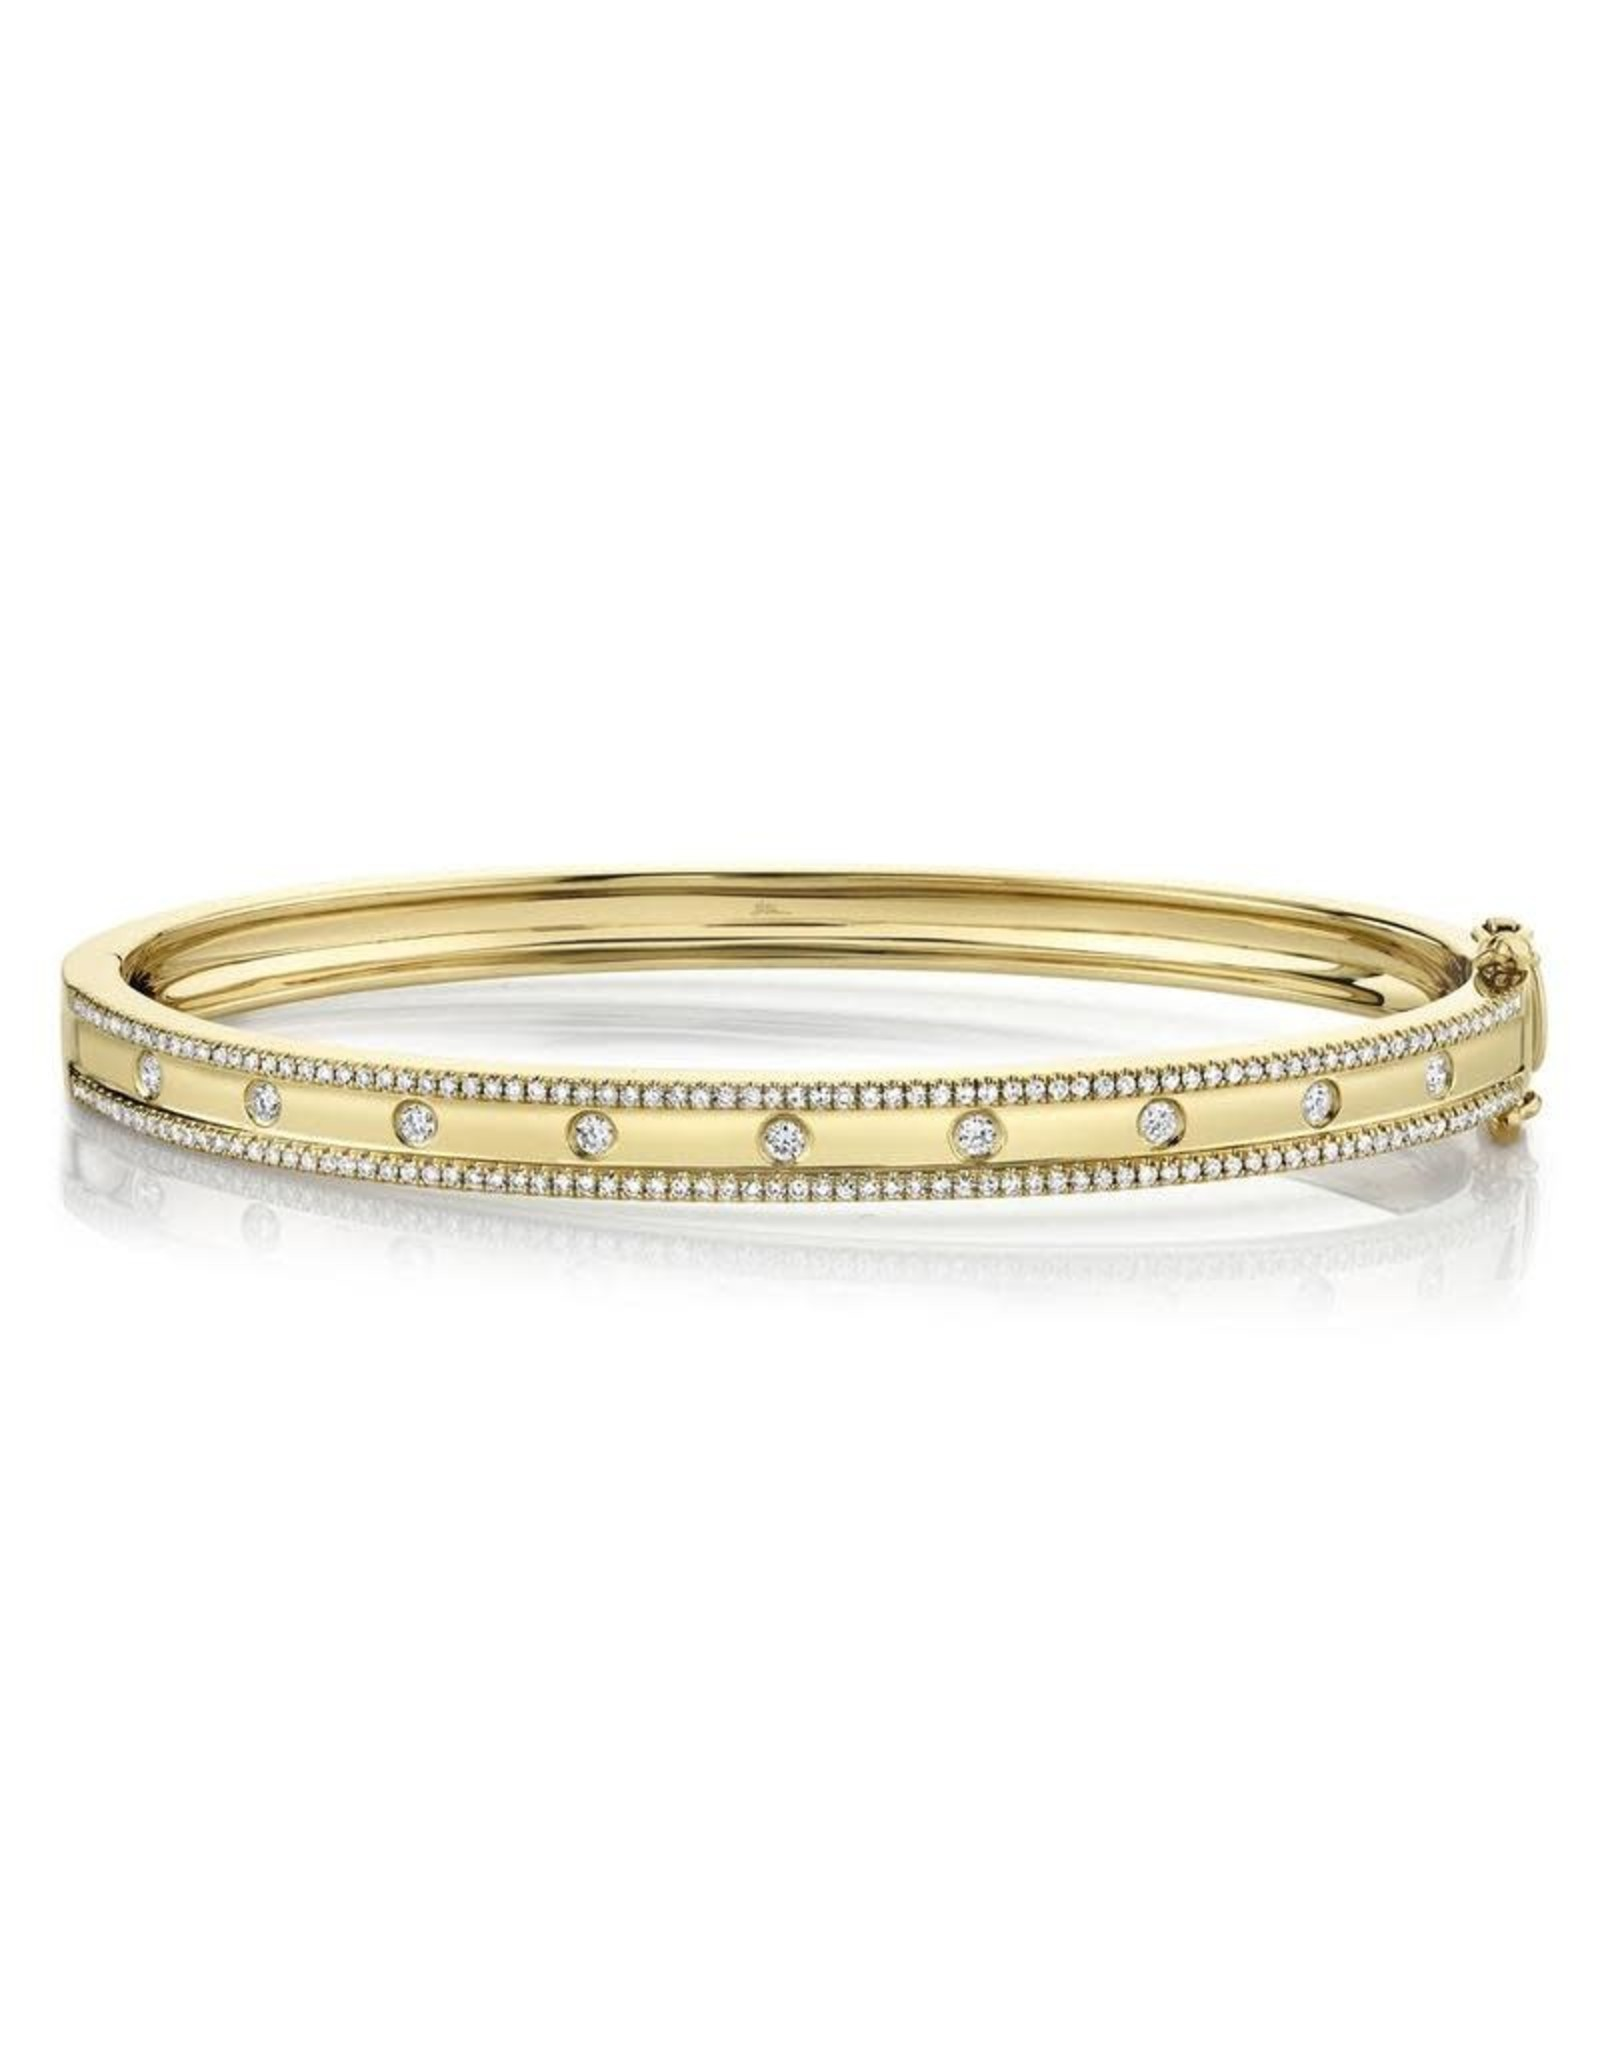 14K Y/G Diamond Bangle Bracelet, D: 0.62ct